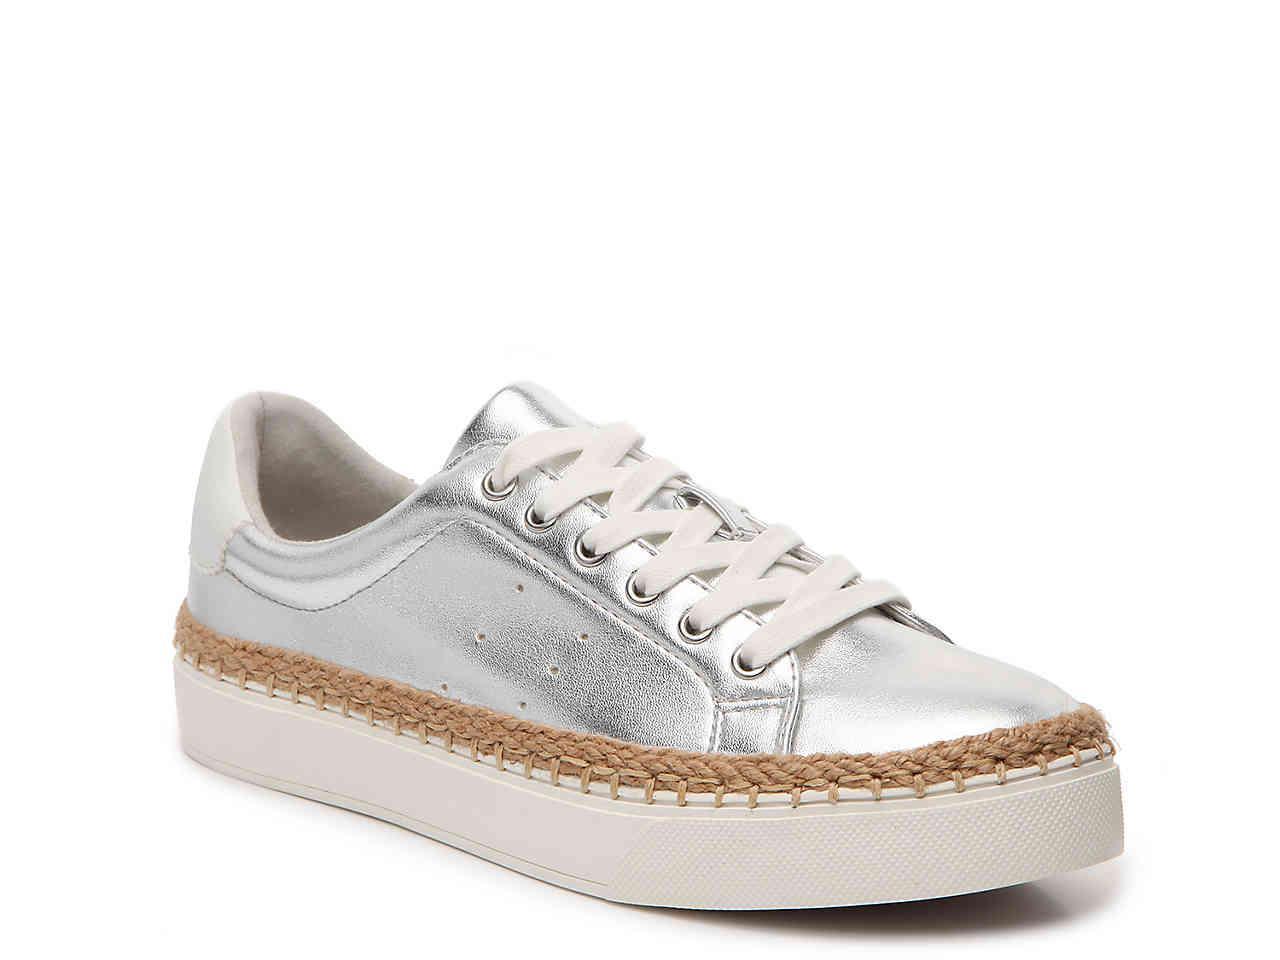 99b82d87ab5 Lyst - ALDO Galililla Sneaker in Metallic